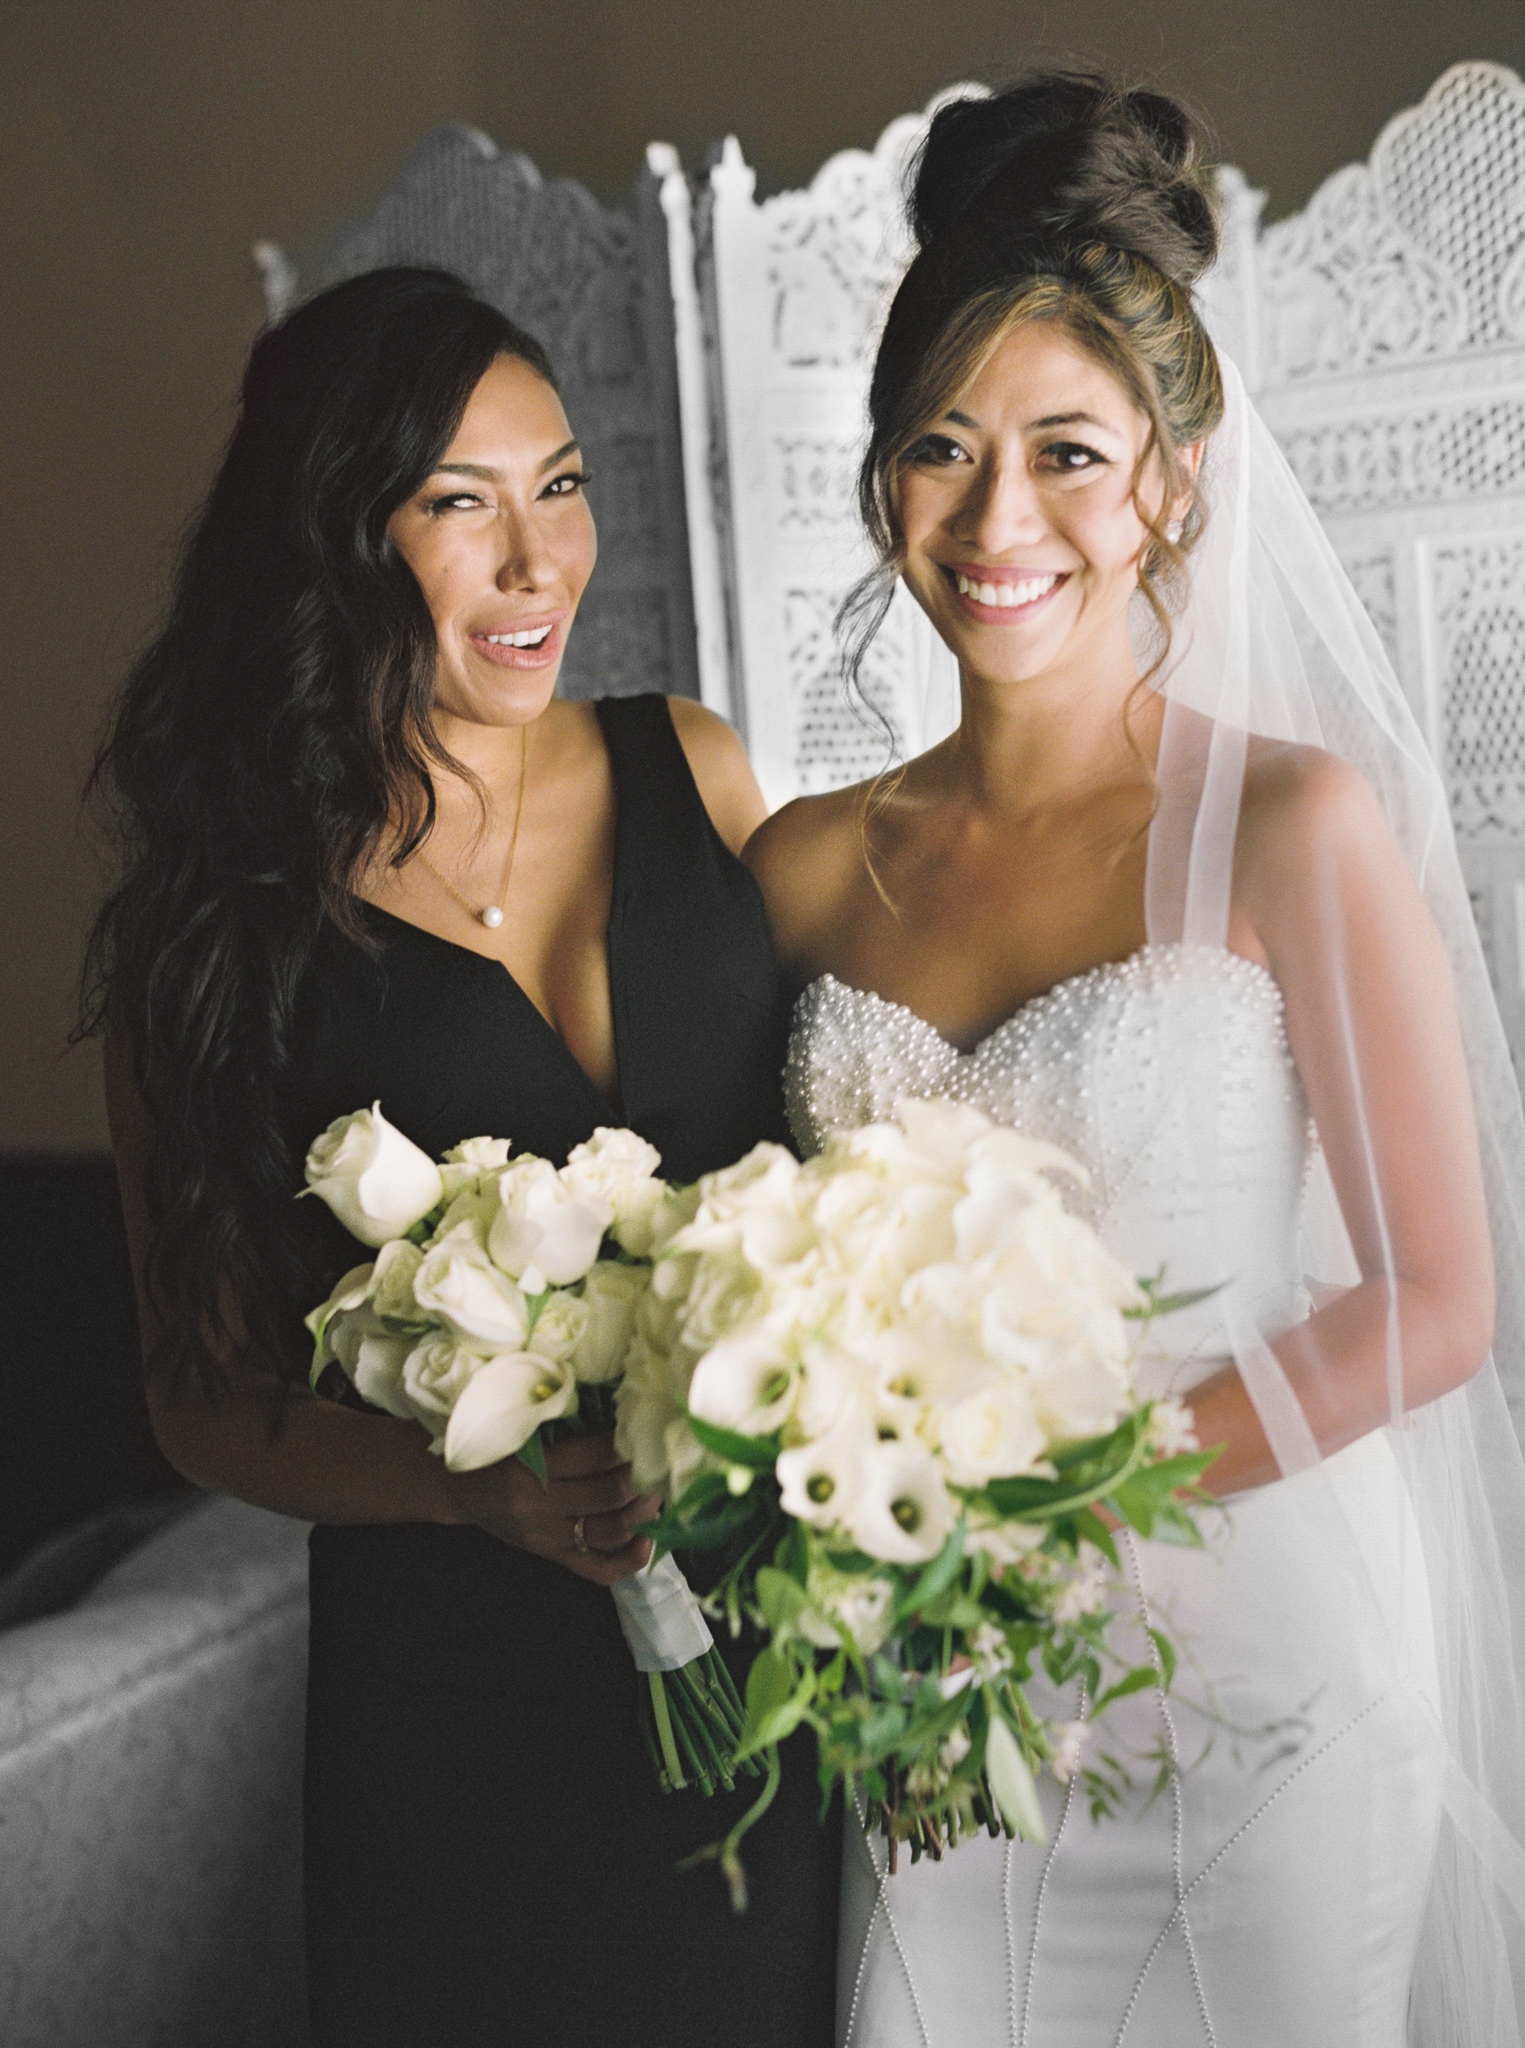 037OutliveCreative_Travel_Photographer_Videographer_Lewis&Clark_Oregon_Elegant_BlackTie_Destination_Wedding.jpg